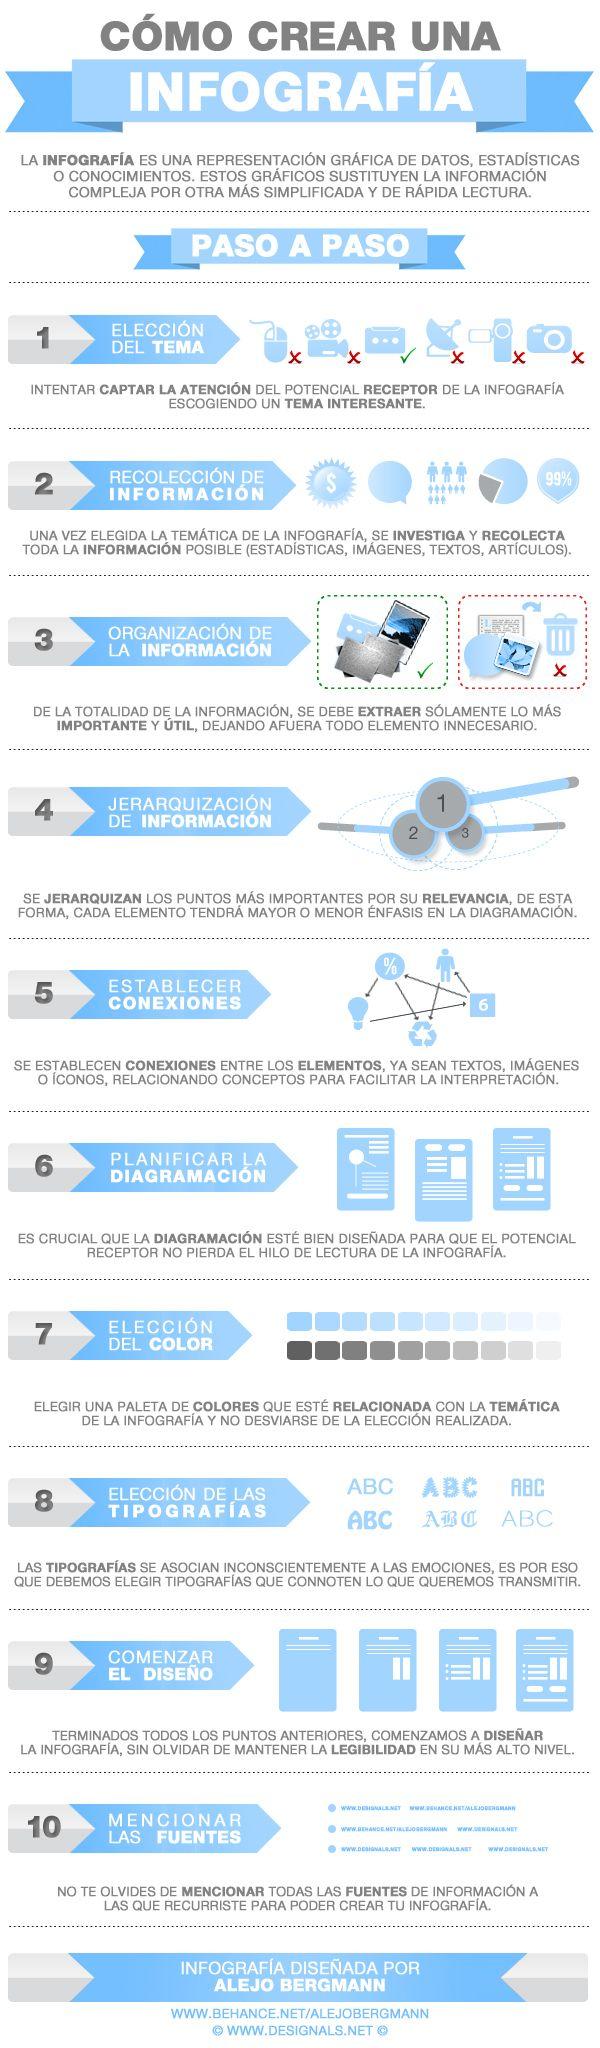 #Infografia #CommunityManager Cómo crear una infografia. #TAVnews